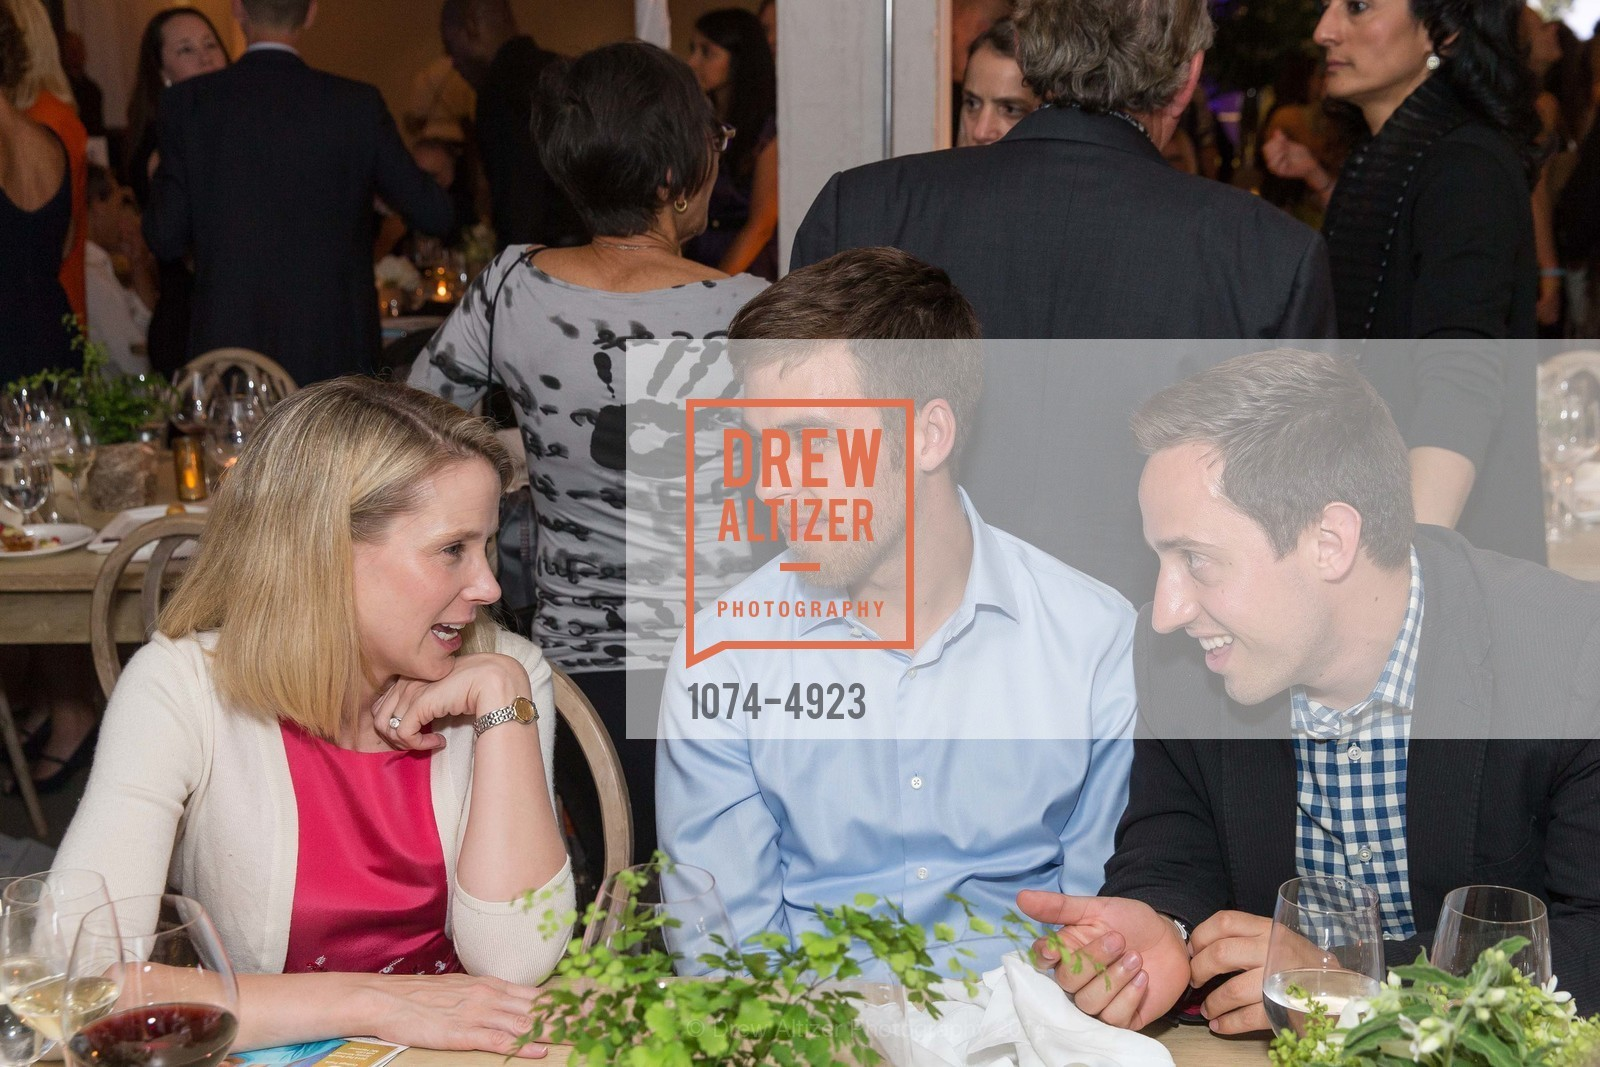 Marissa Mayer, Dan Carroll, Tyler Bosmeny, Photo #1074-4923